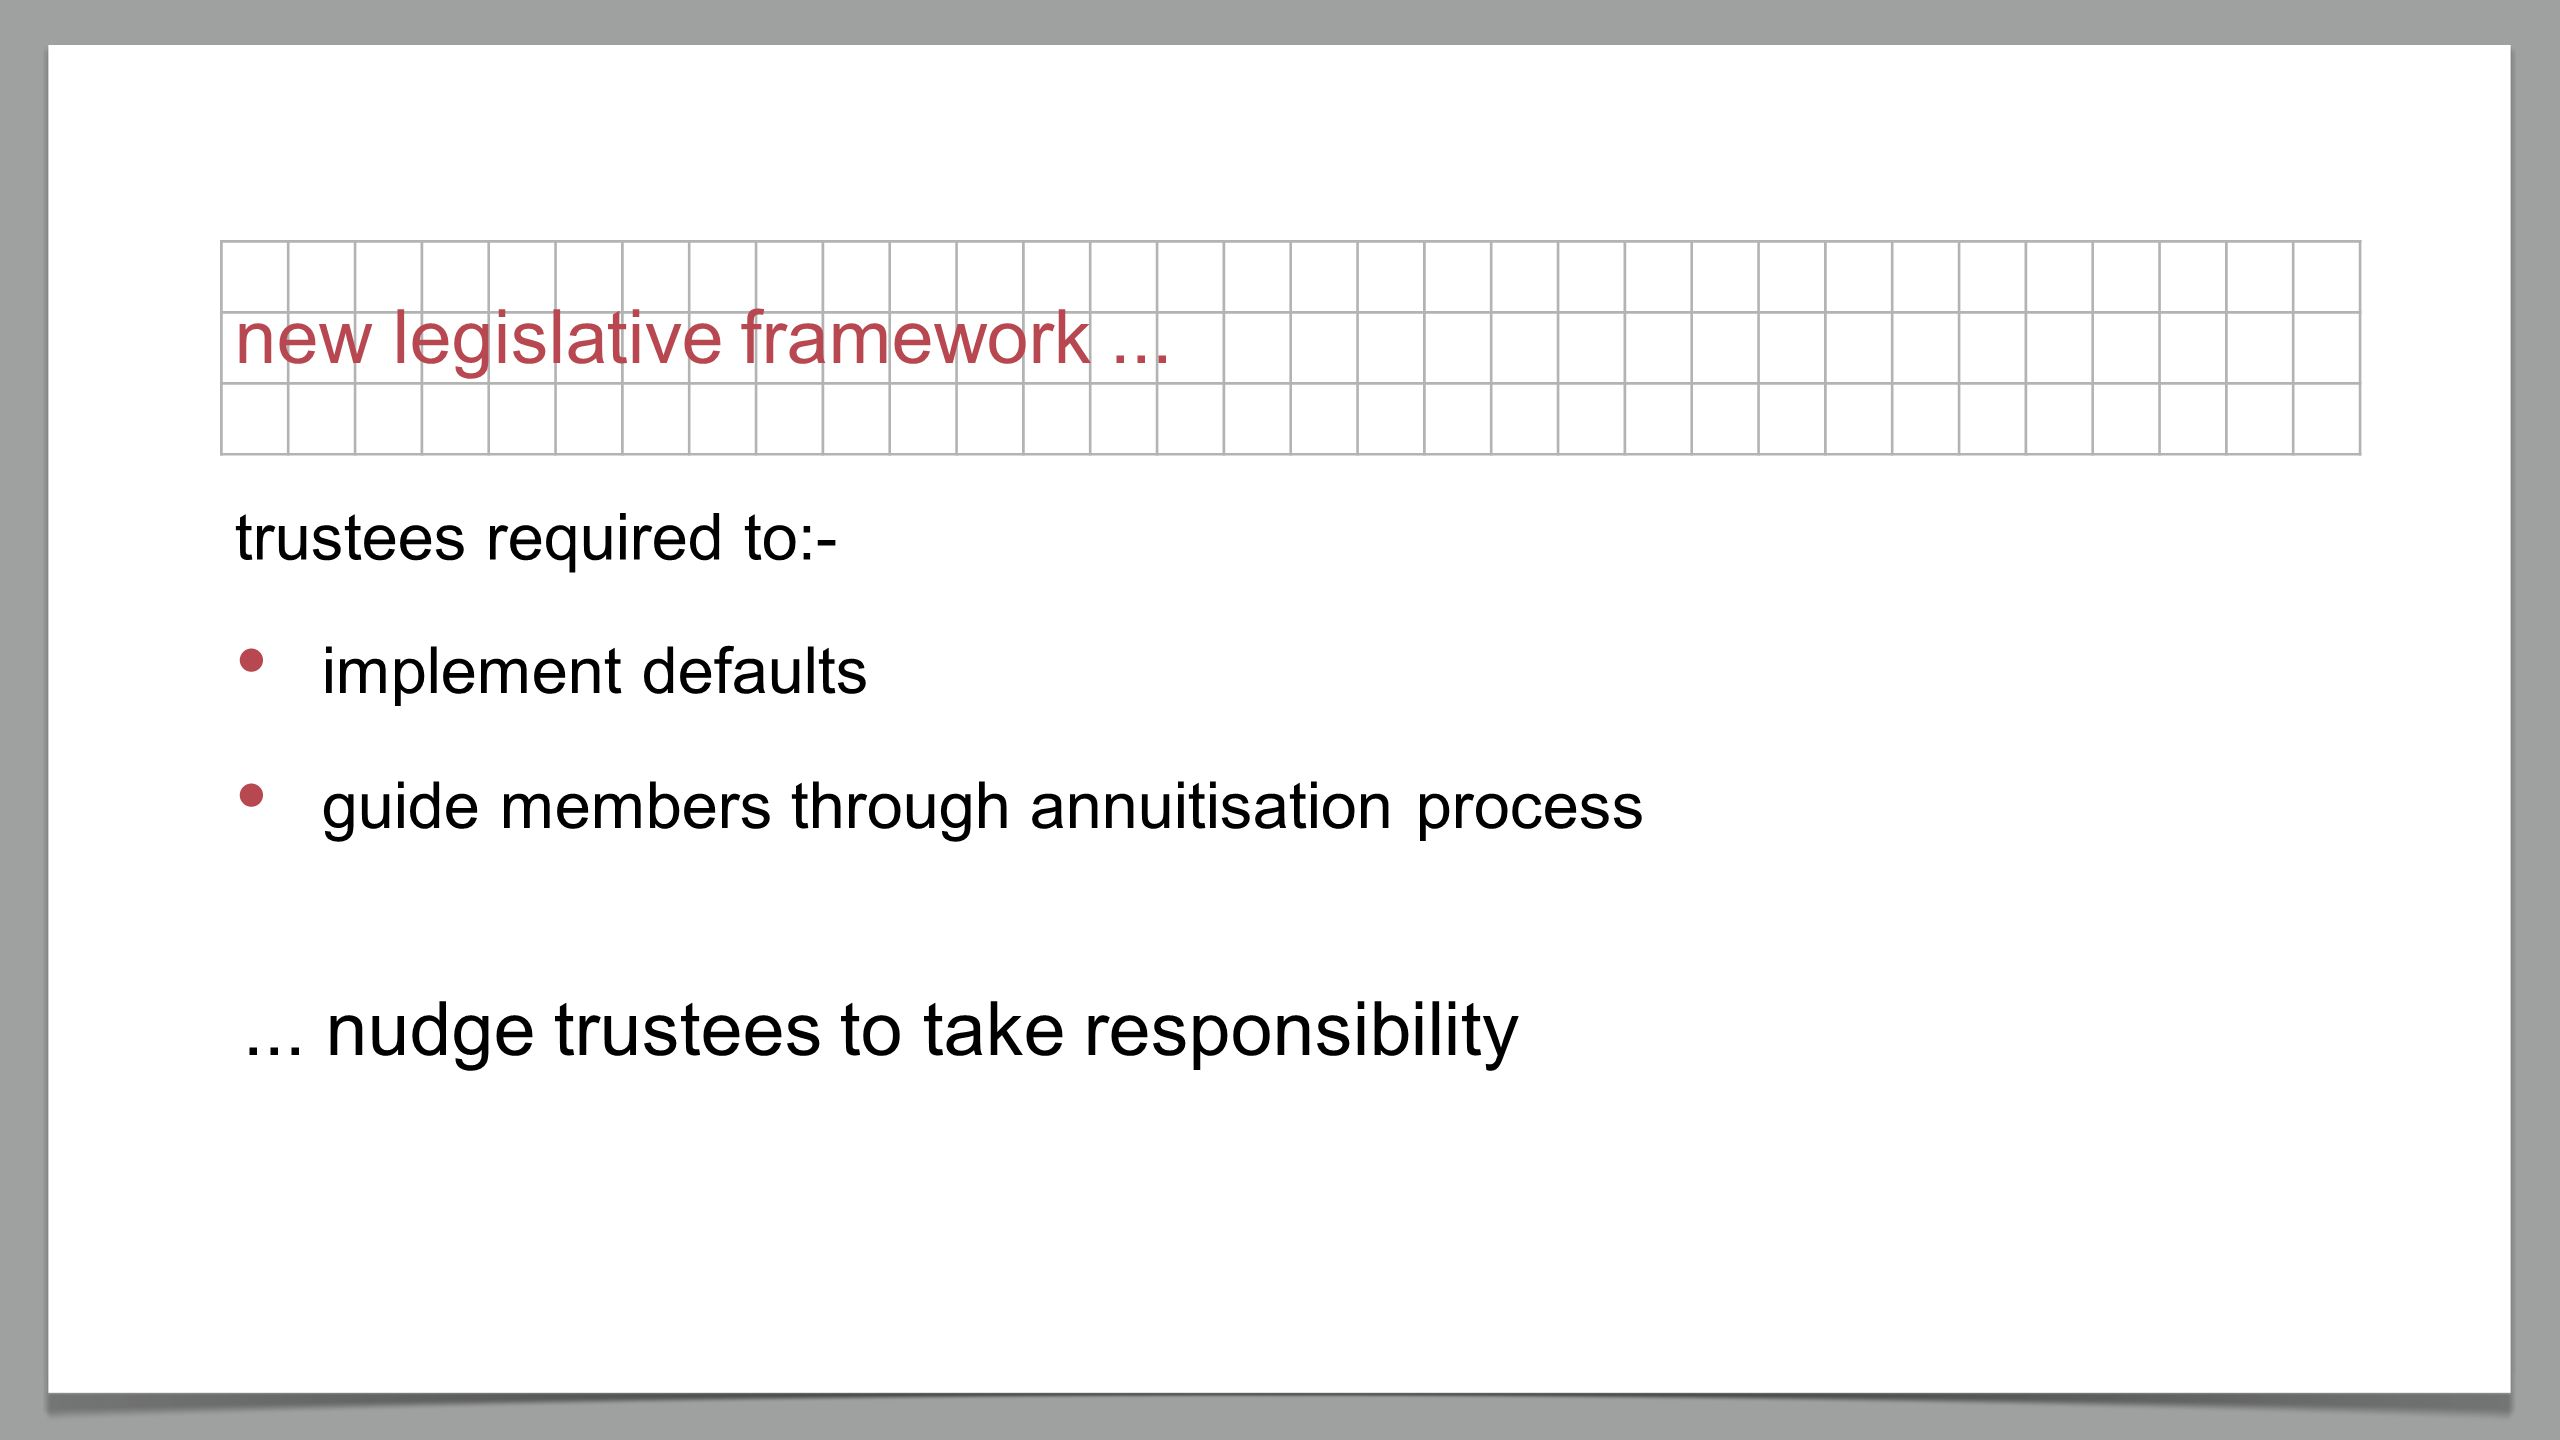 new legislative framework... implement defaults guide members through annuitisation process...